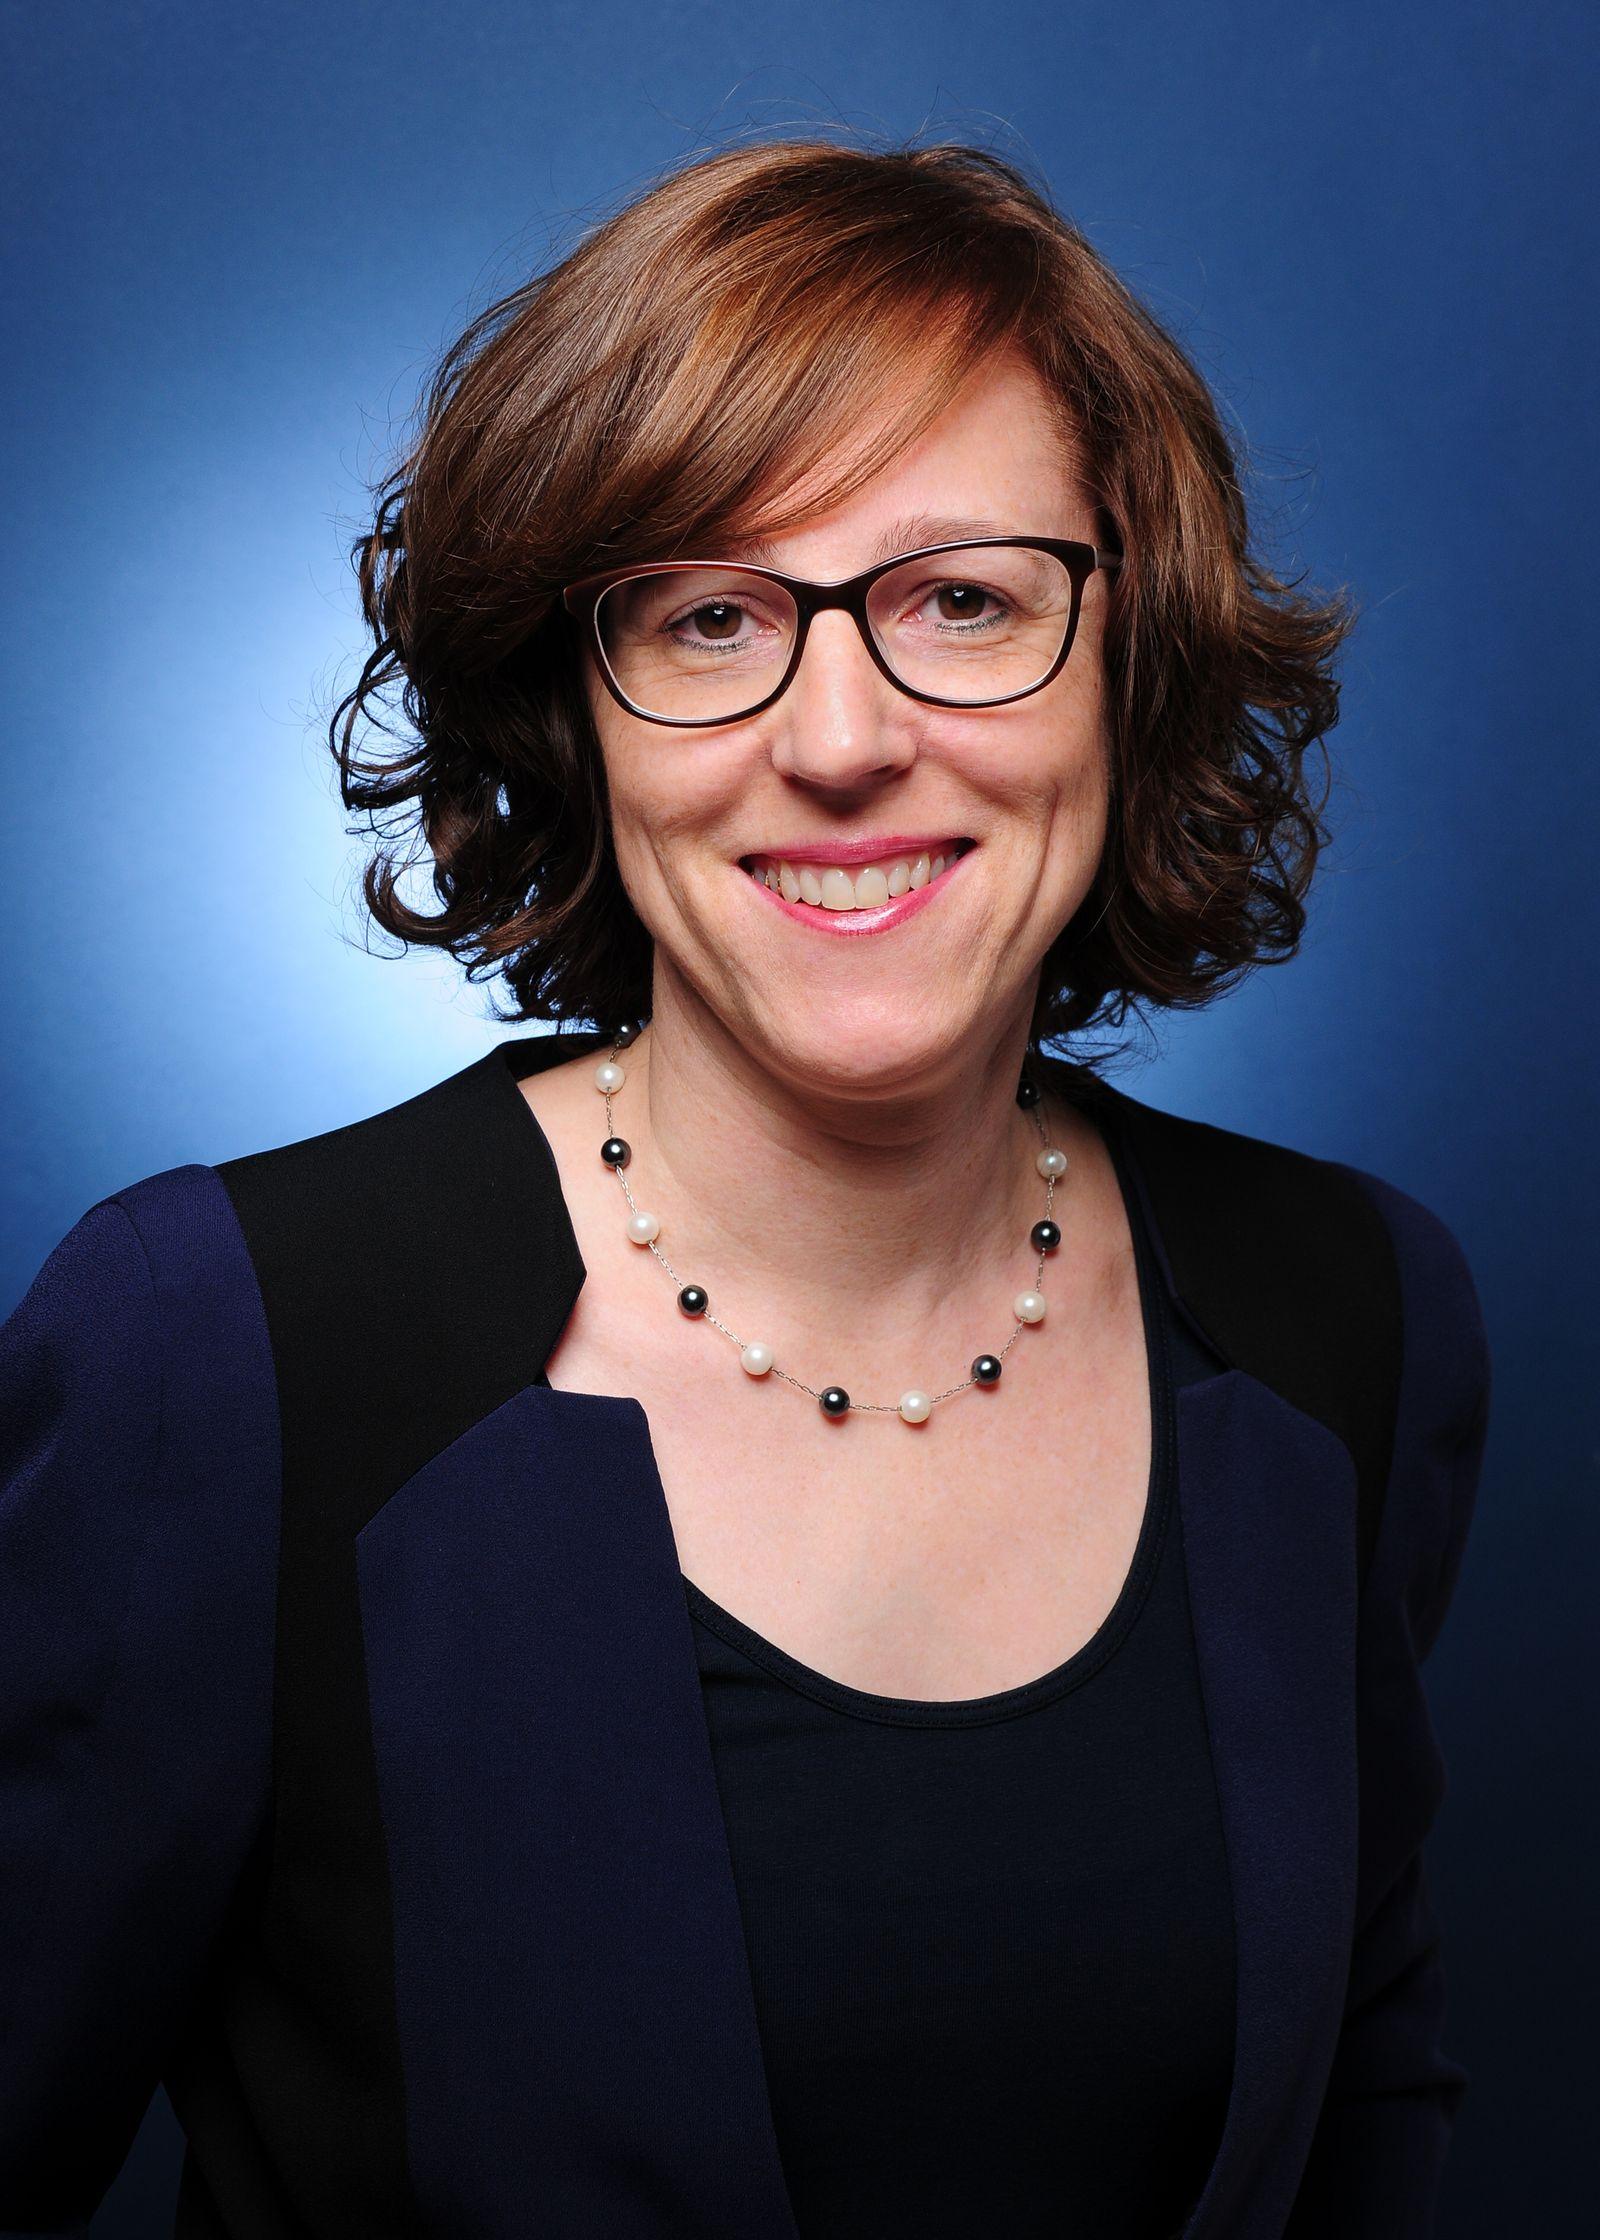 Sabine Hubbertz-Josat